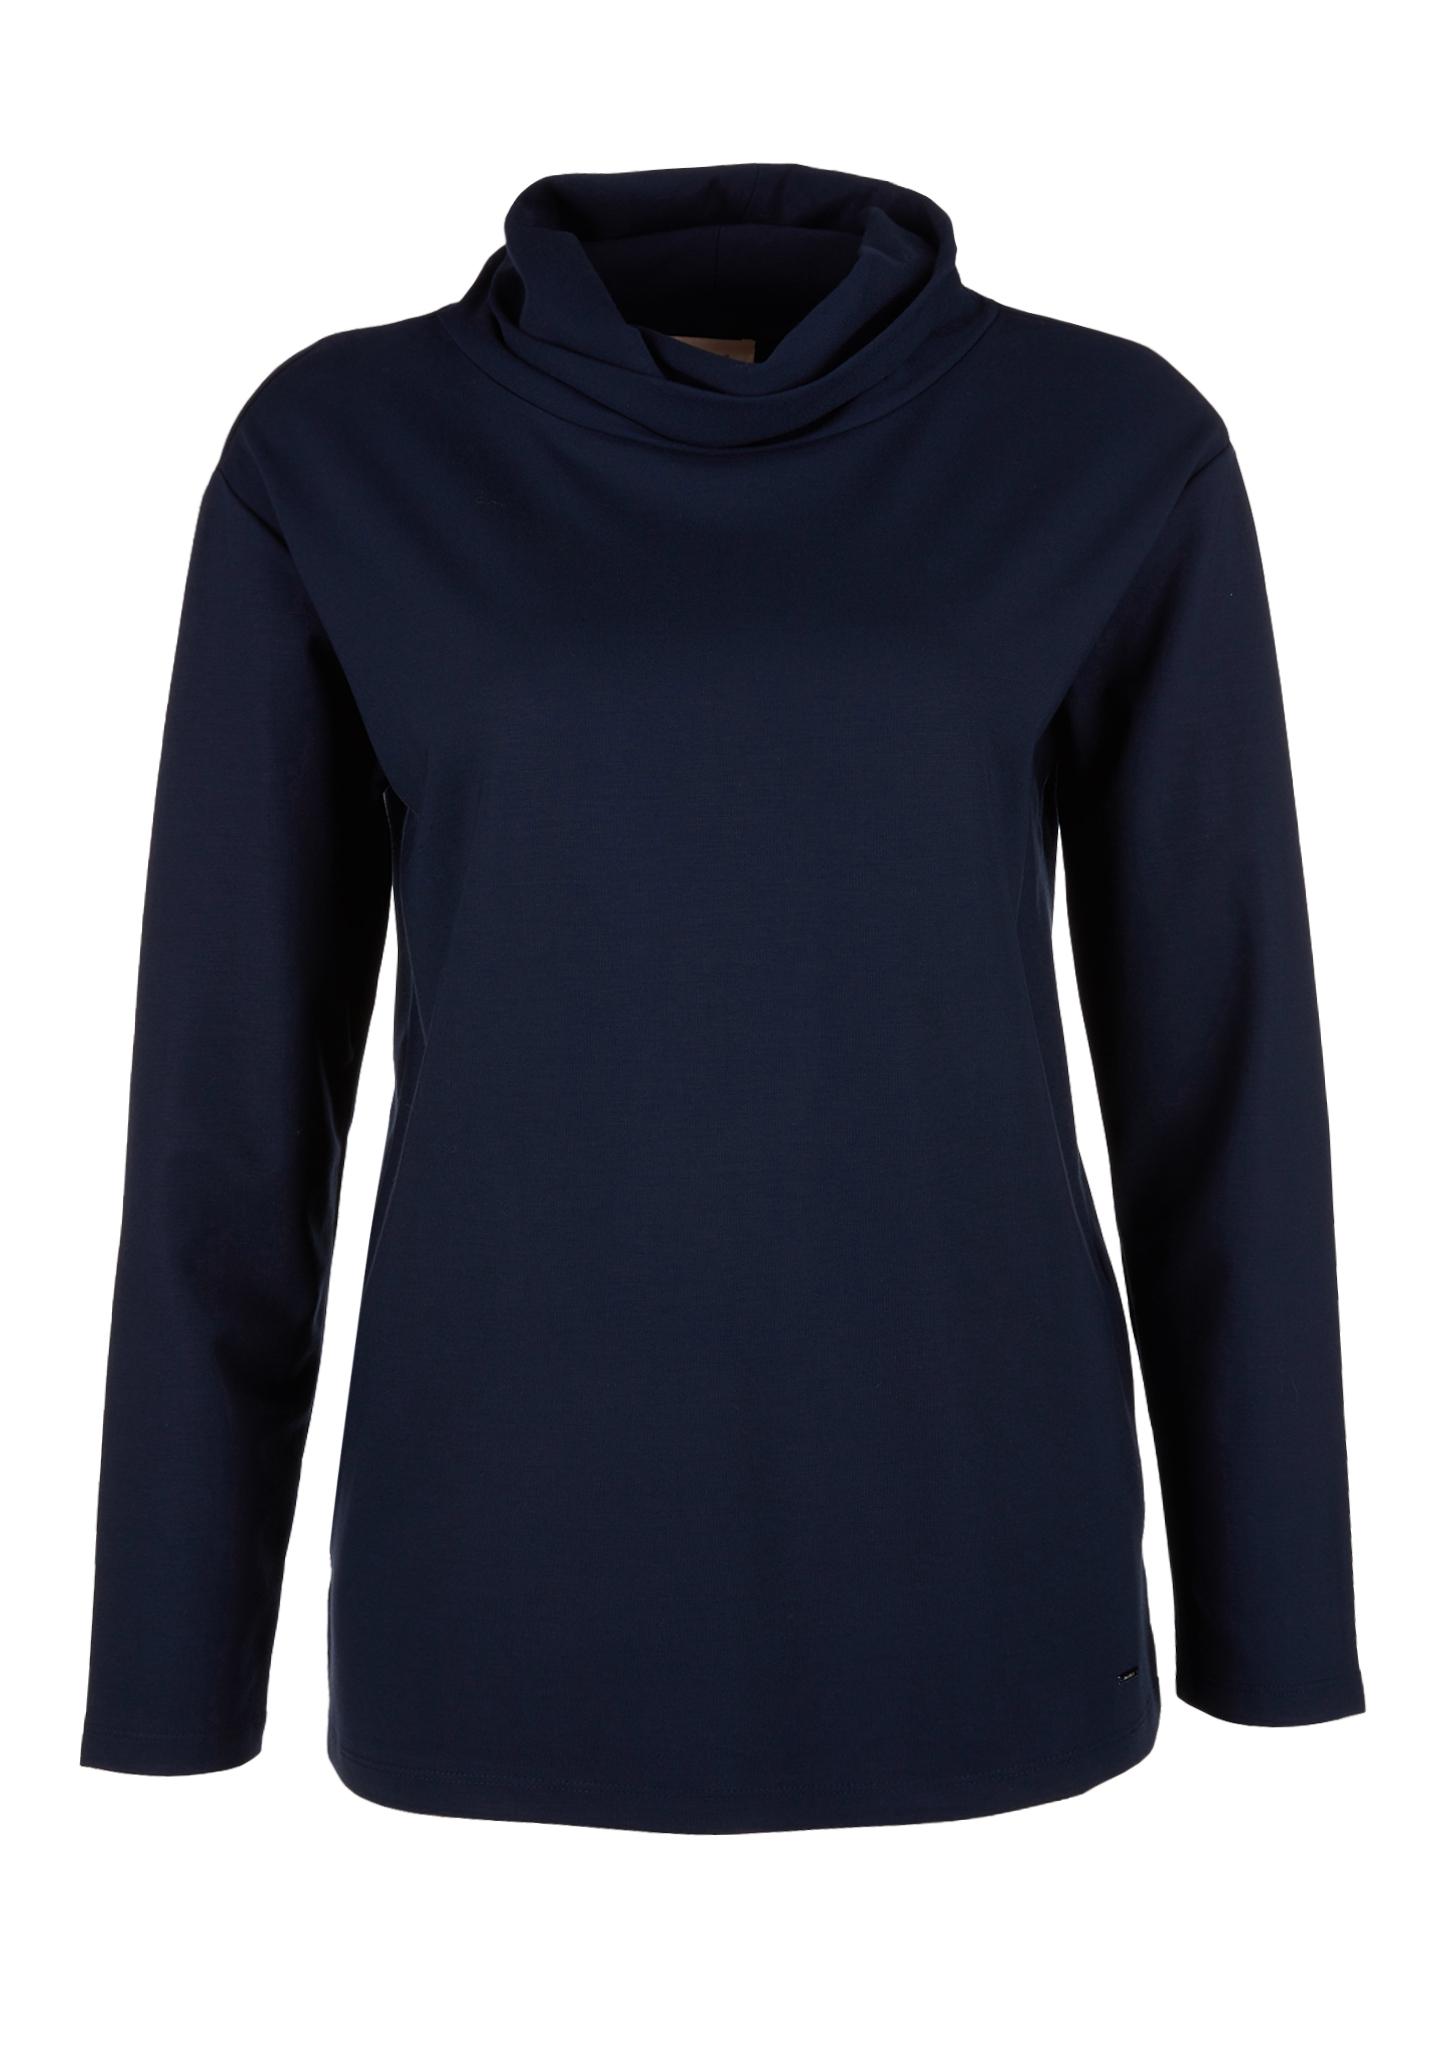 Rollkragenshirt | Bekleidung > Shirts > Rollkragenshirts | Blau | 69% viskose -  28% polyester -  3% elasthan | TRIANGLE